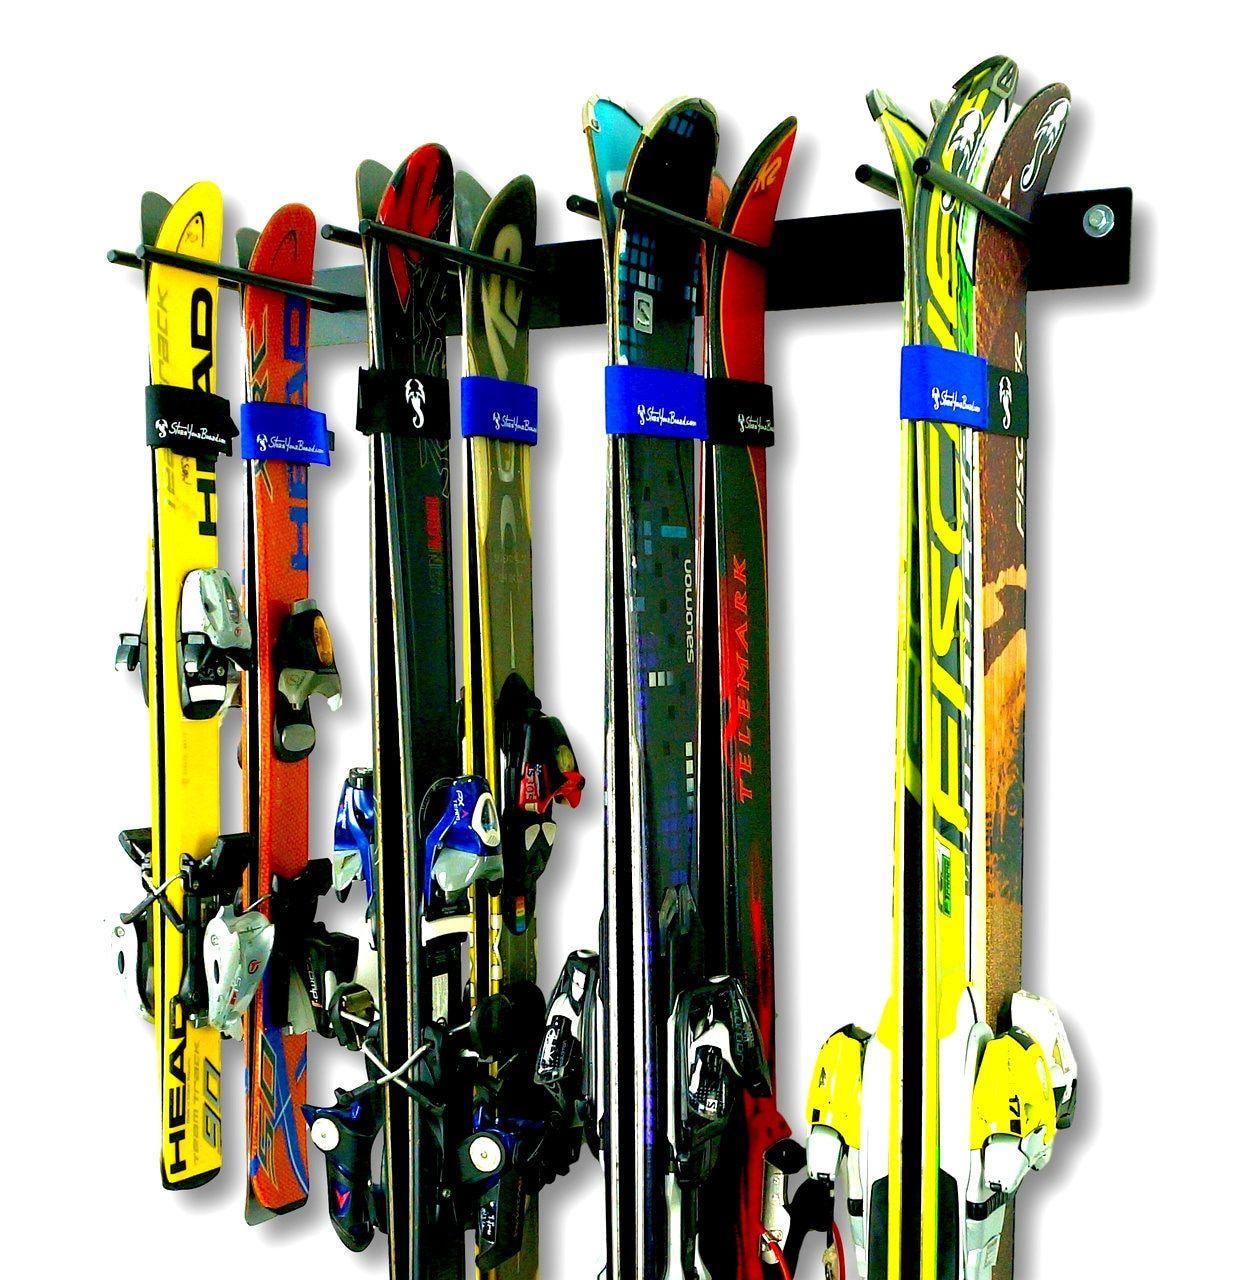 Blat Ski Storage Rack Wall Mount Holds Up To 8 Pairs Of Skis Ski Rack Storage Rack Wall Storage